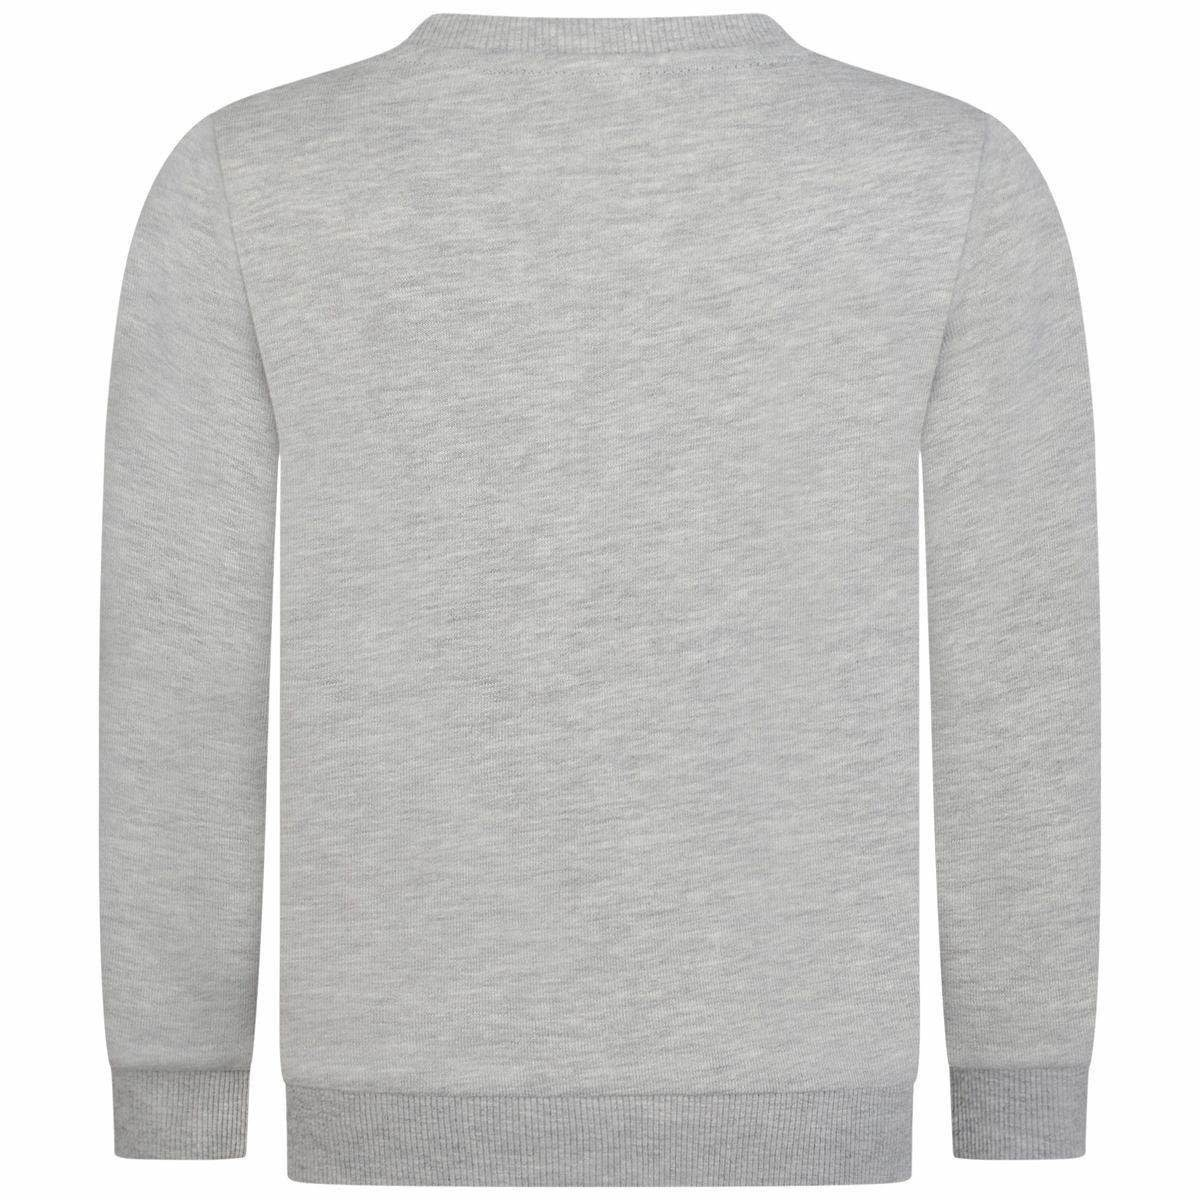 Guess Guess Boys Grey Logo Jogger Set